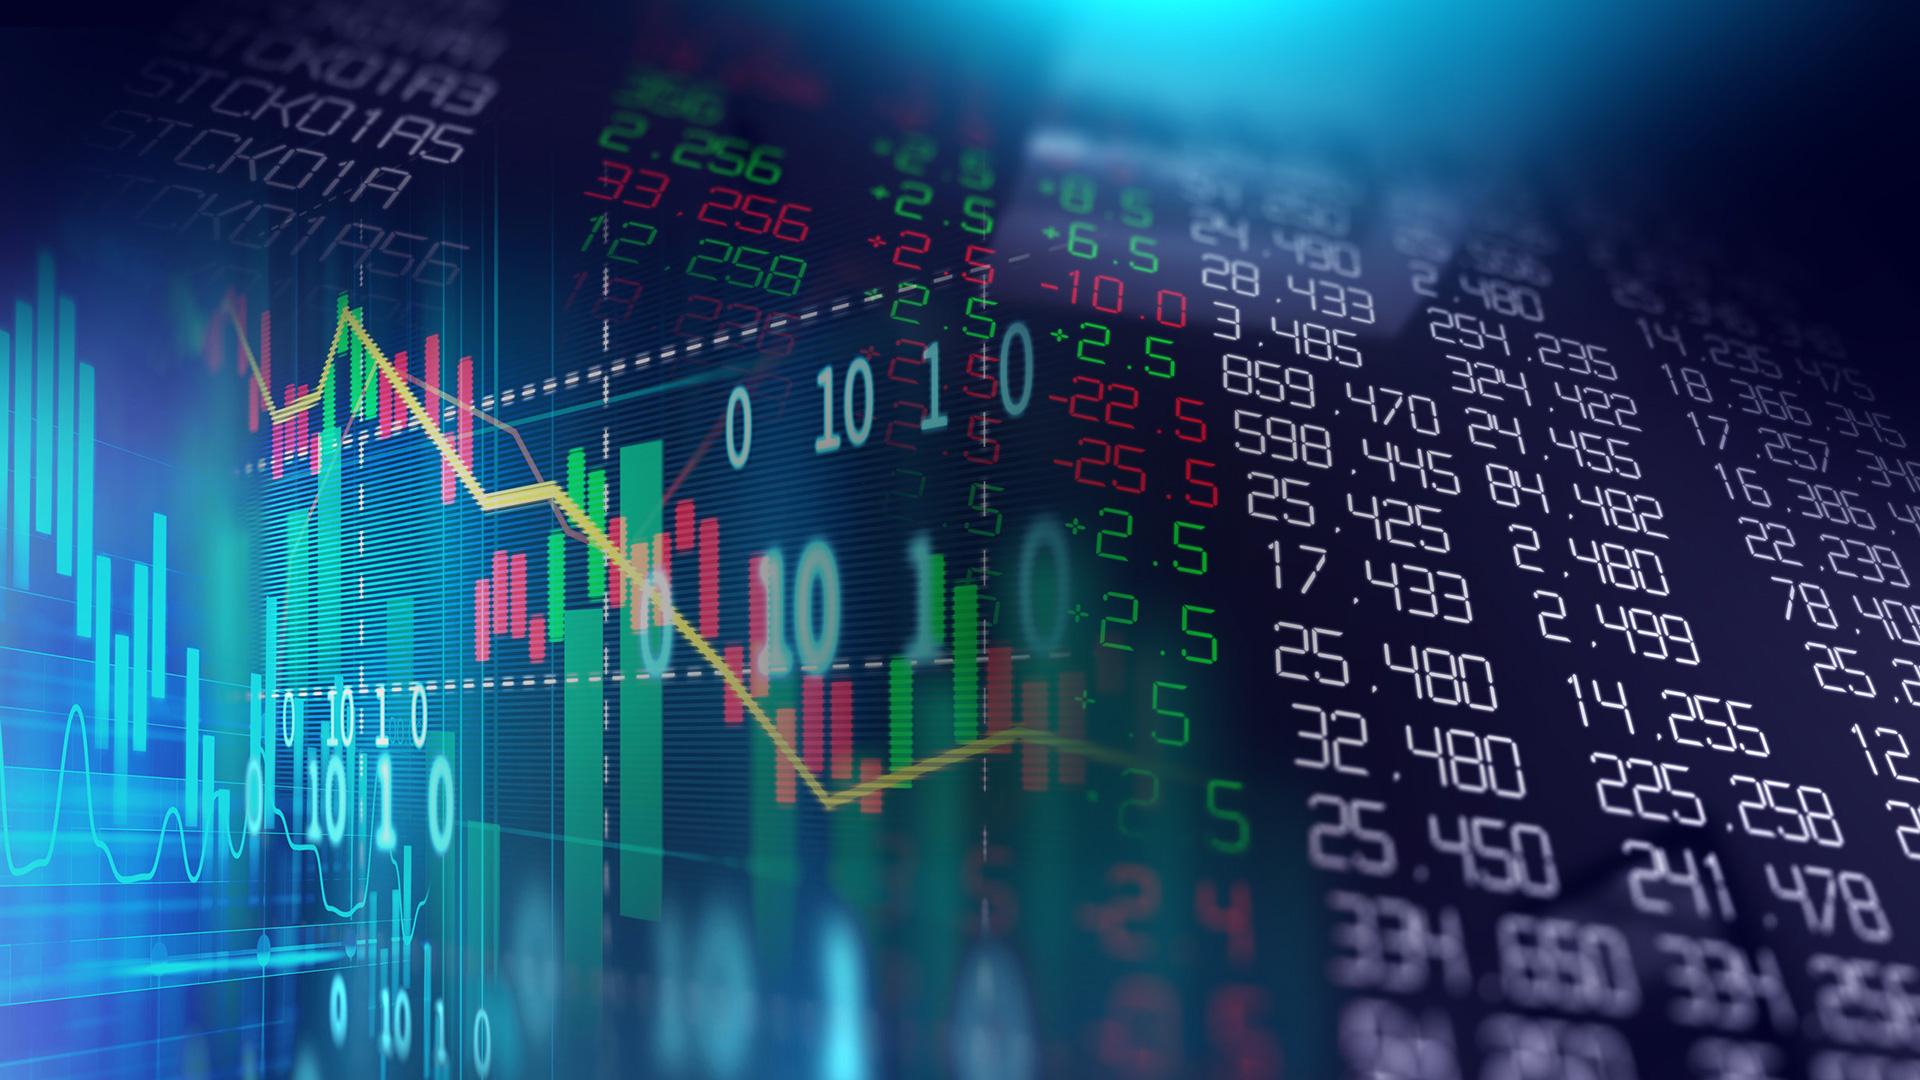 Financial stock market graph illustration